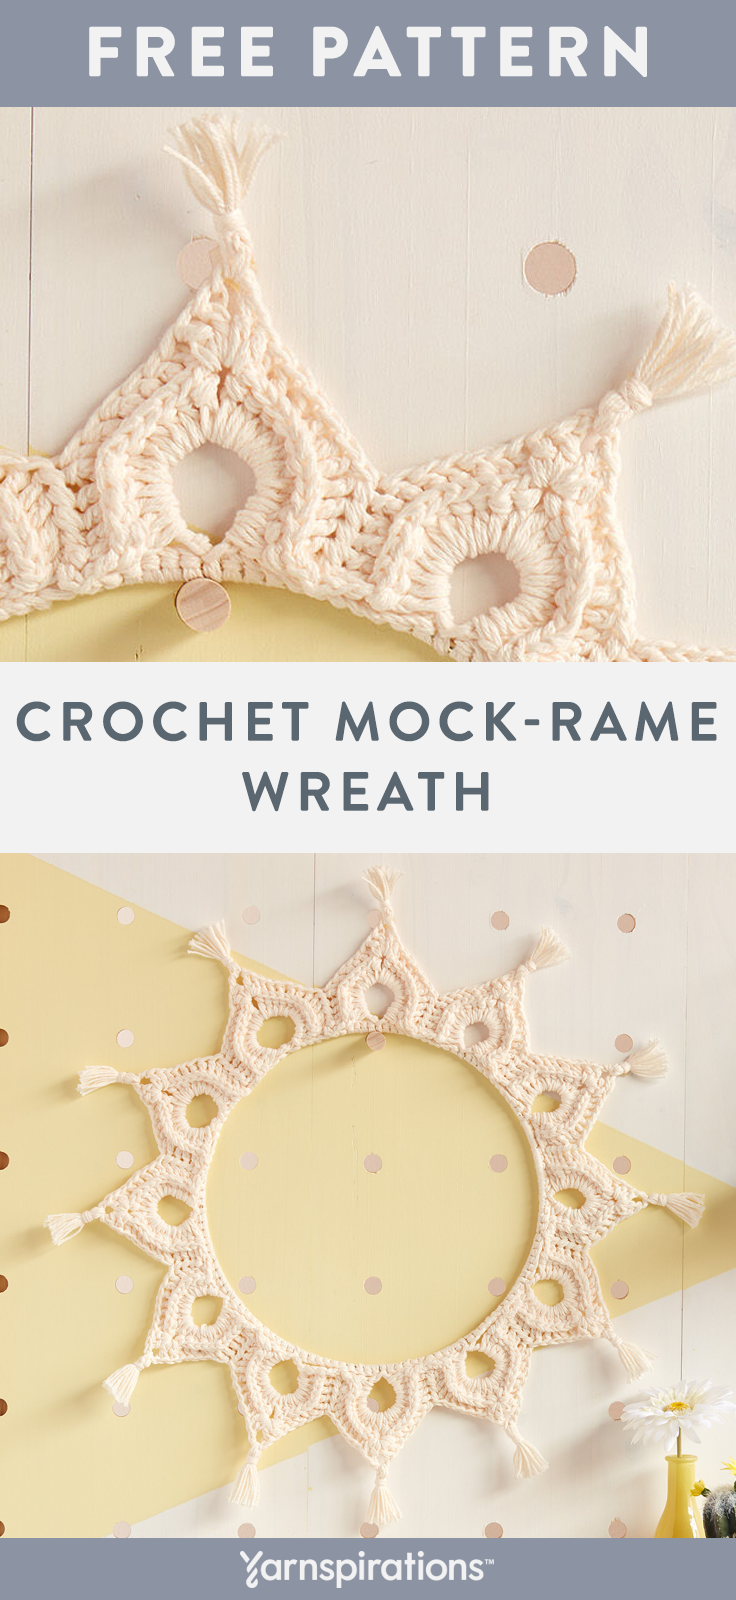 Photo of Free Crochet Pattern | Yarnspirations | Lily Sugar'n Cream Yarn | Crochet Mock-R…